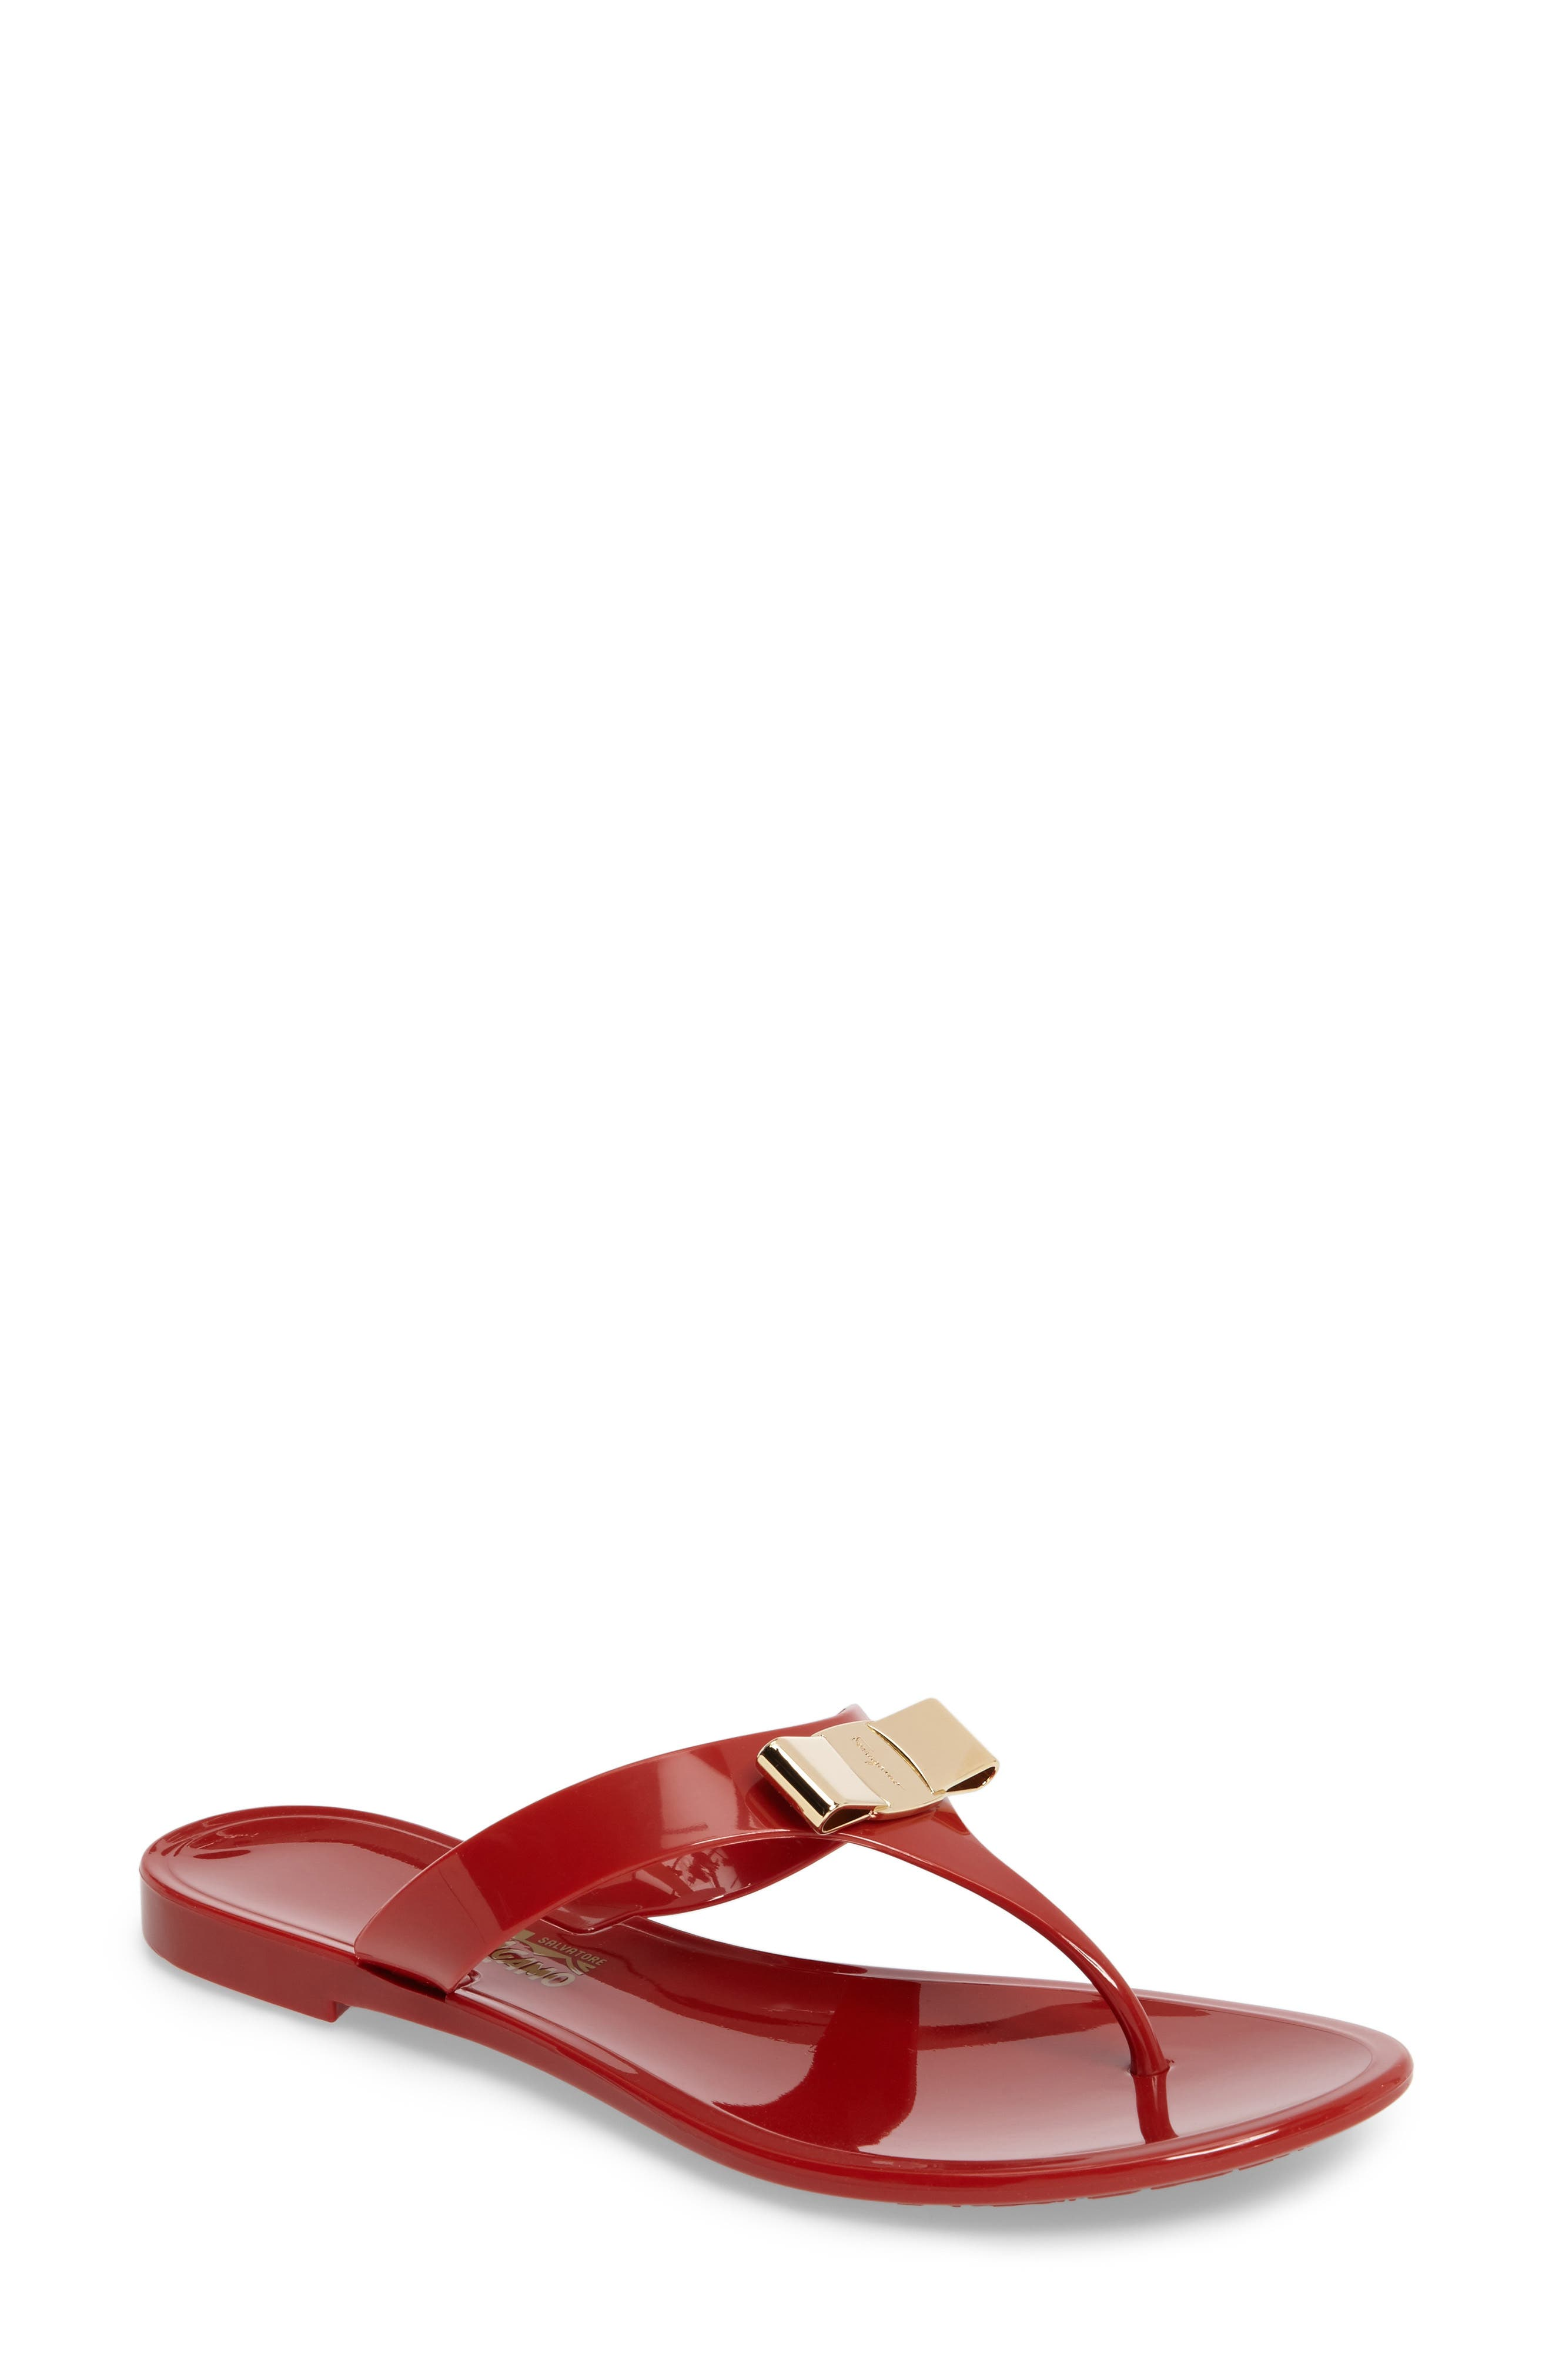 Farelia Jelly Flat Bow Sandal,                         Main,                         color, Red Pvc